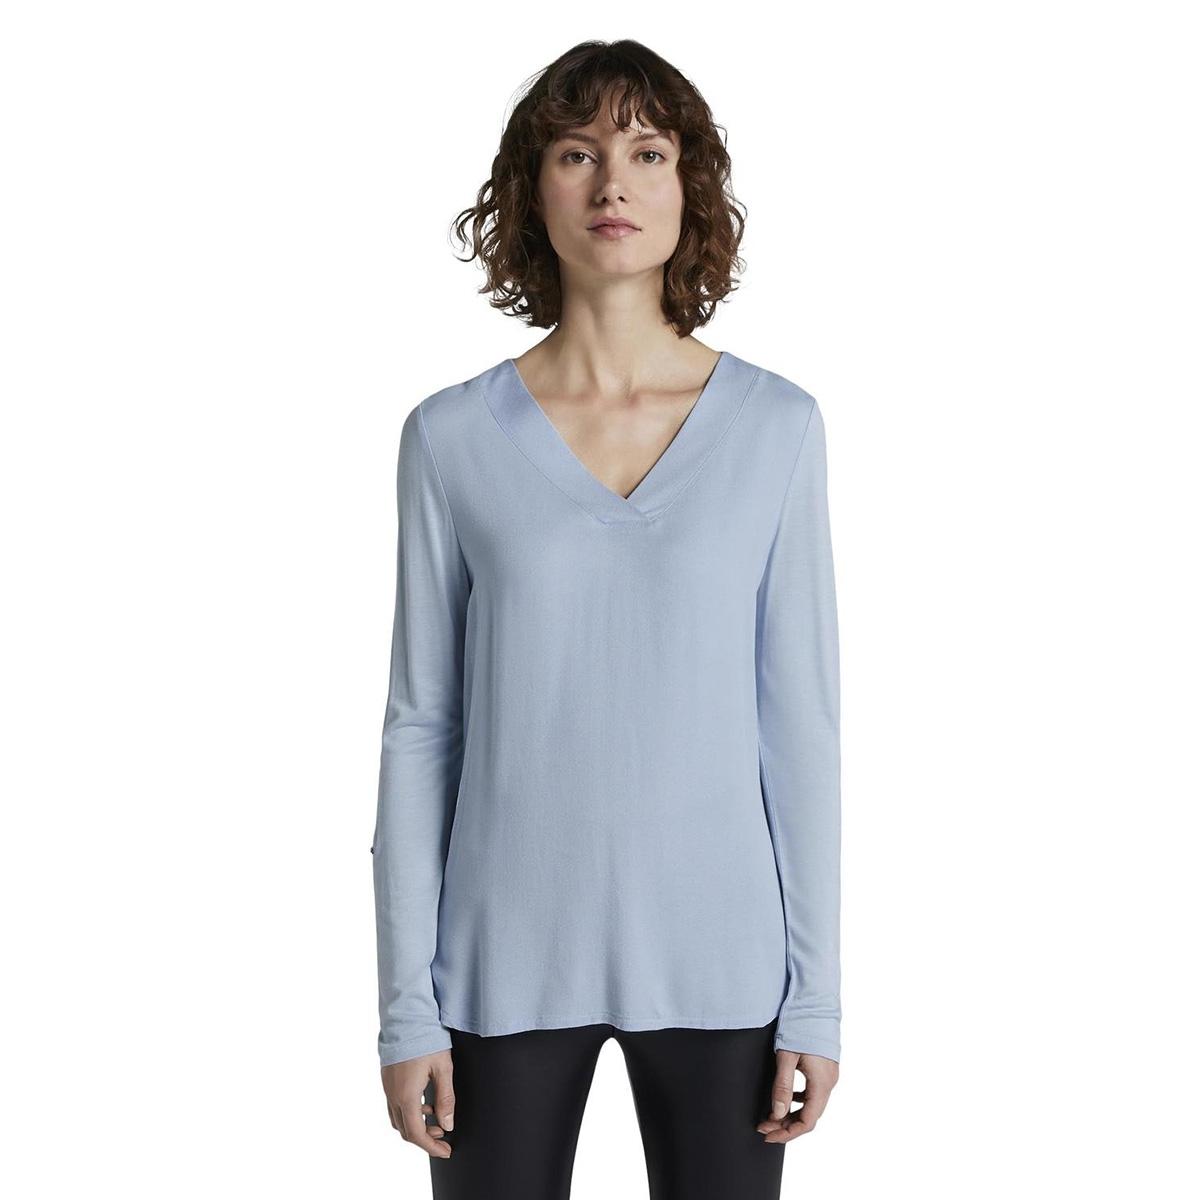 blouse shirt met v hals 1016125xx70 tom tailor t-shirt 11270